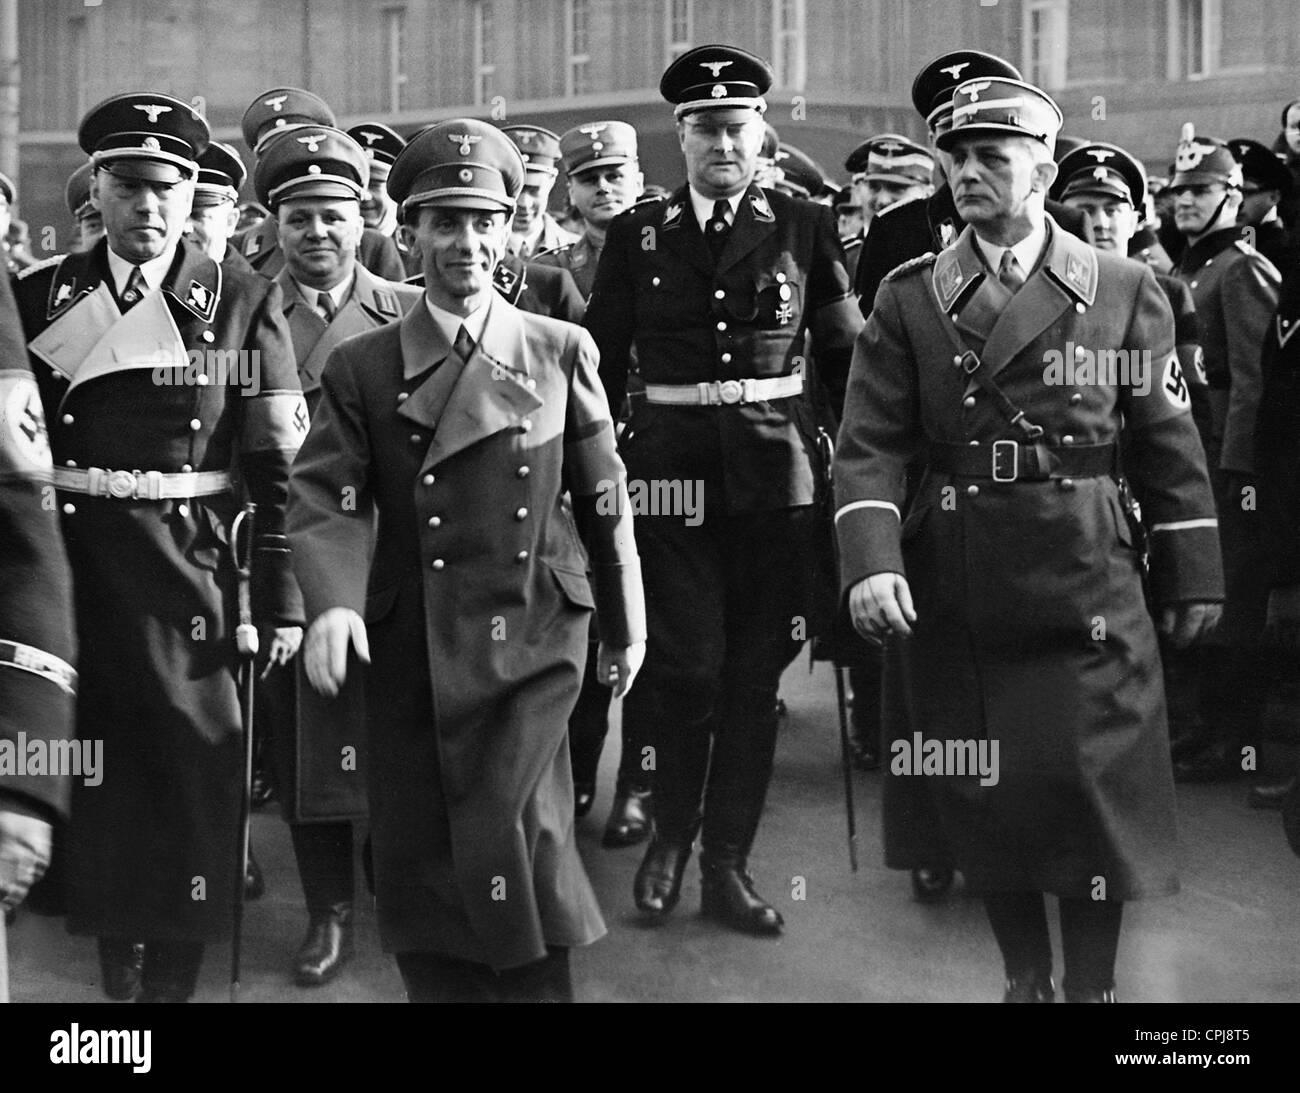 Joseph Goebbels und Ludwig Fichte in Leipzig, 1939 Stockfoto